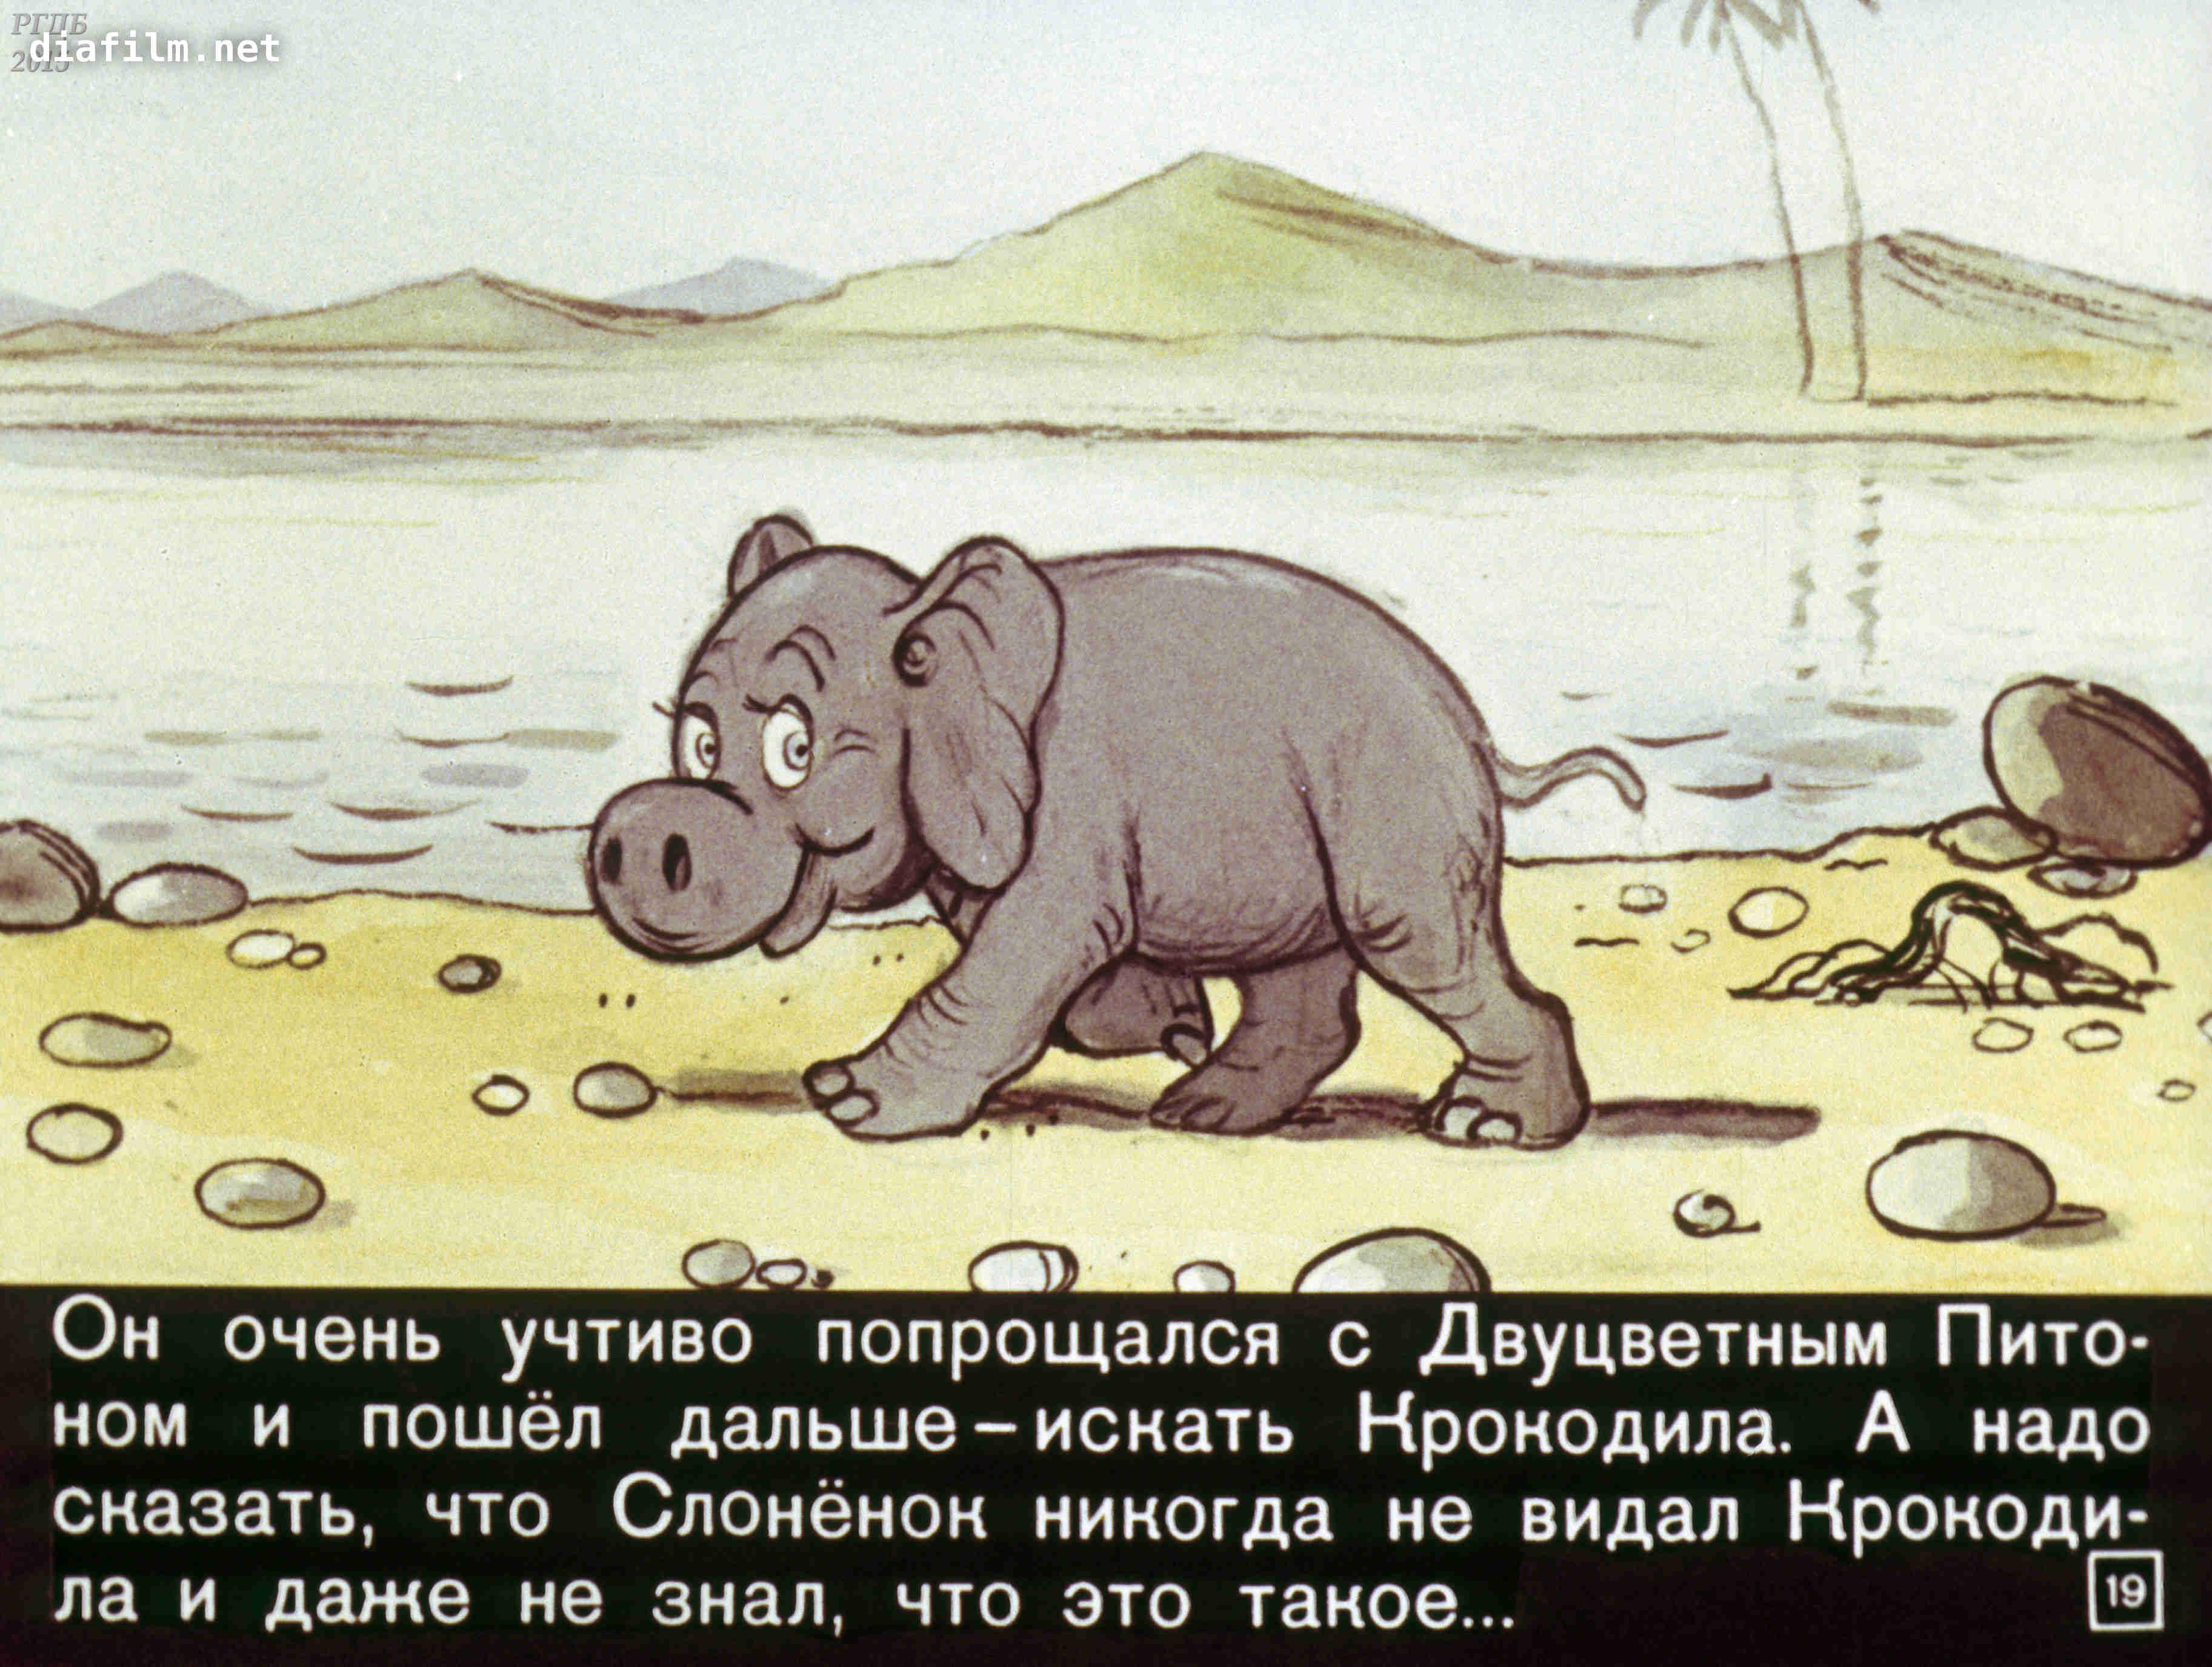 Надписью, киплинг картинки слоненок